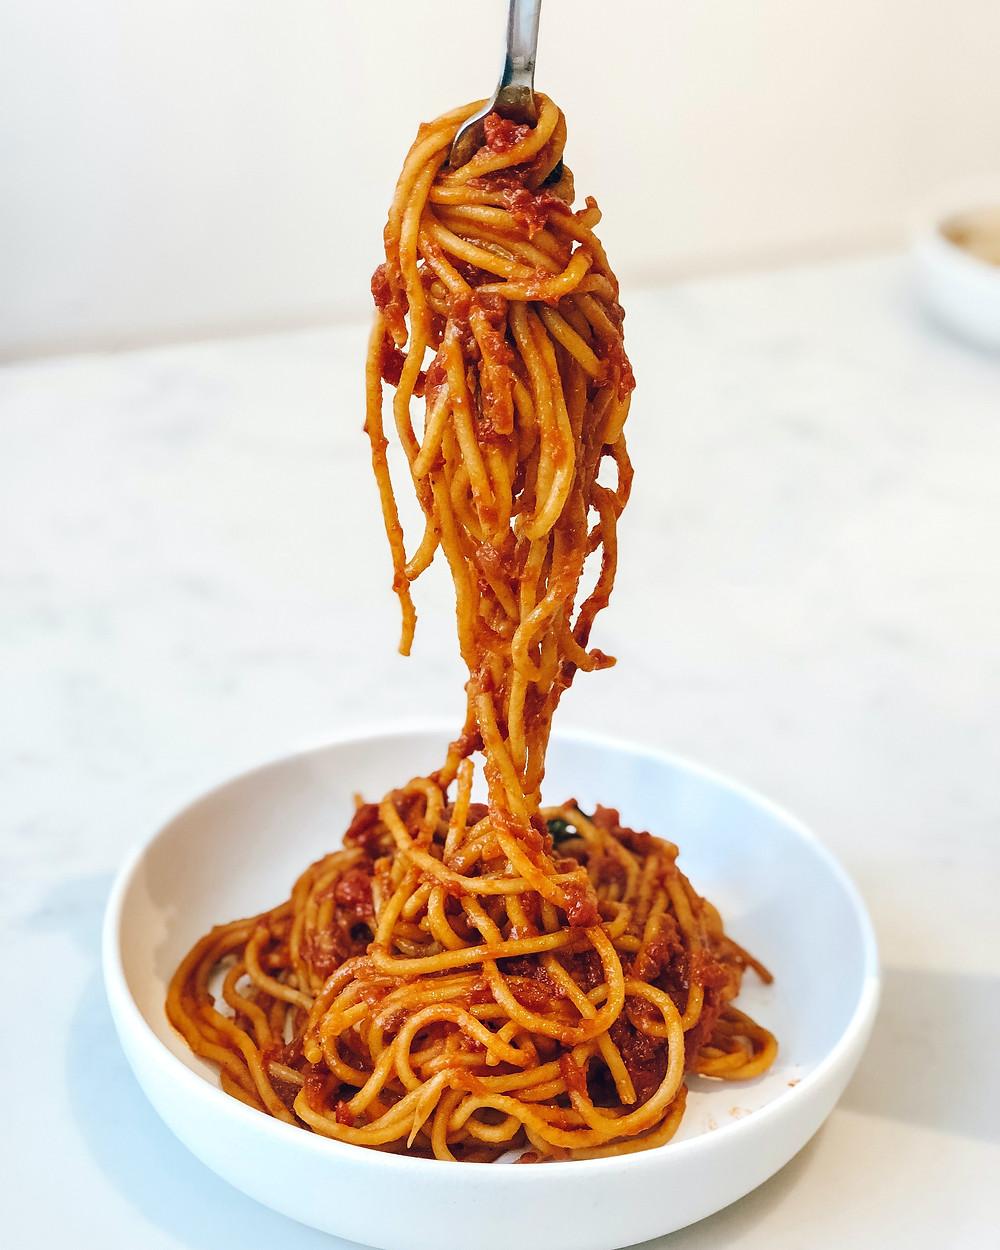 spaghetti in a bowl / fully grown